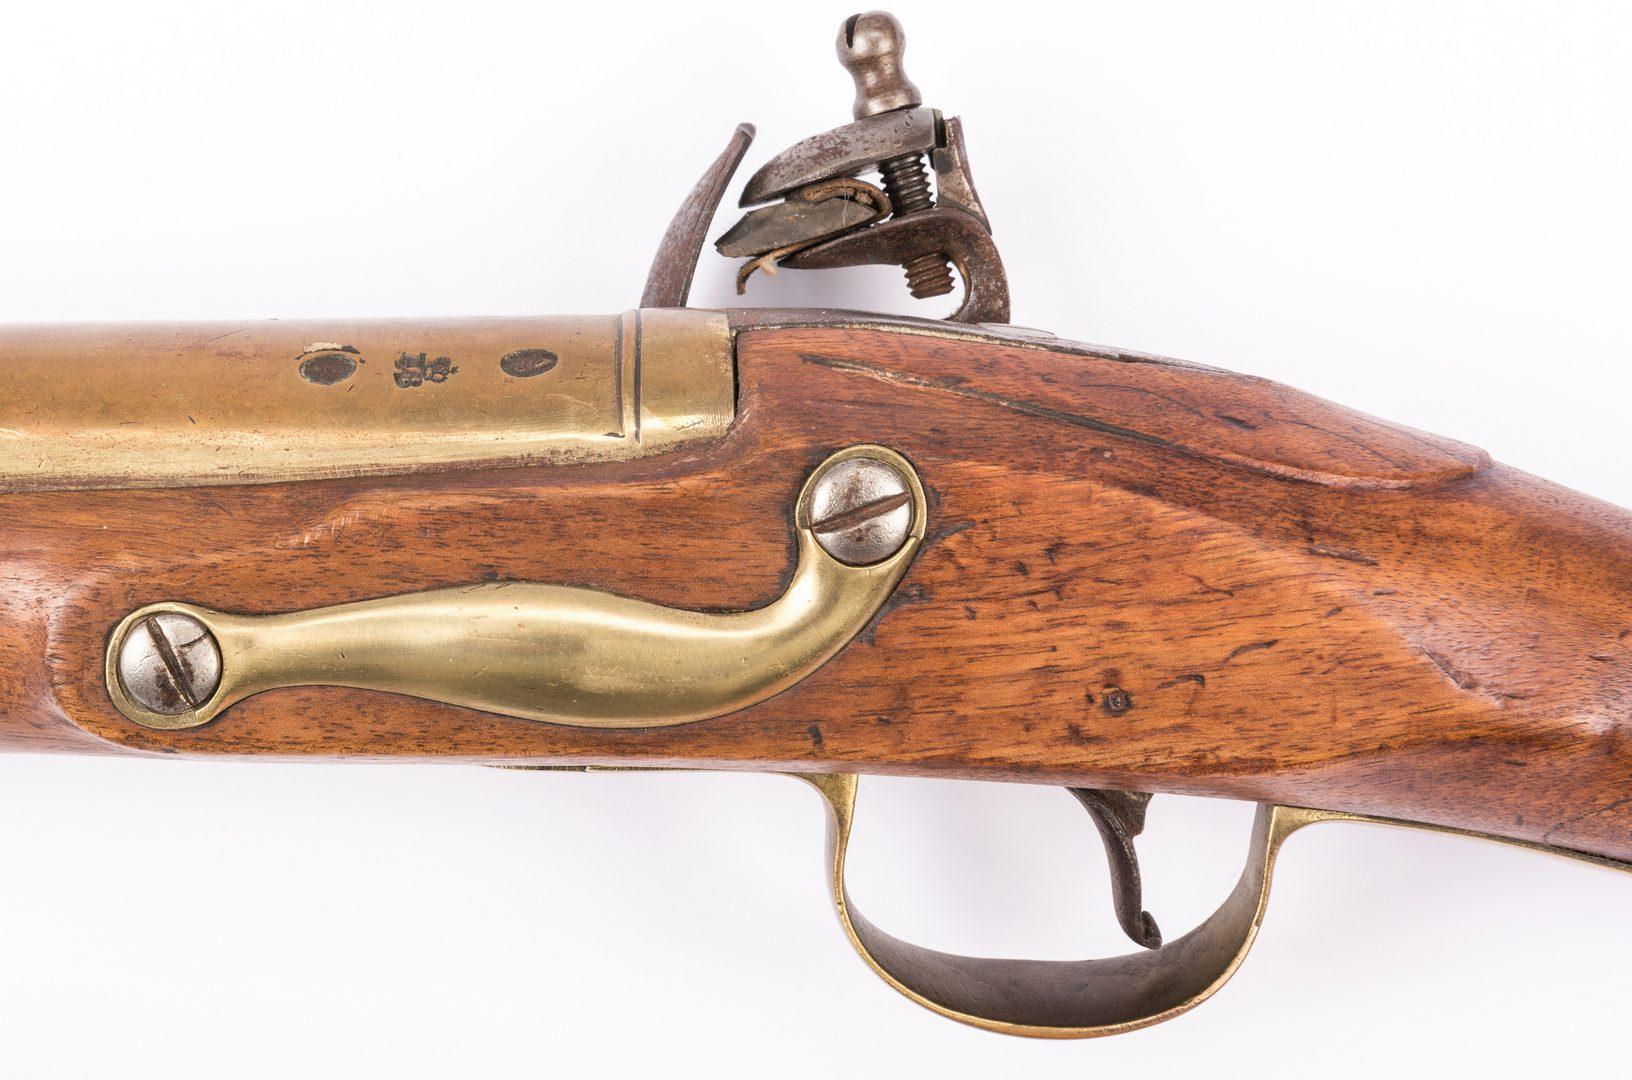 Lot 796: English Flintlock Blunderbuss Pistol